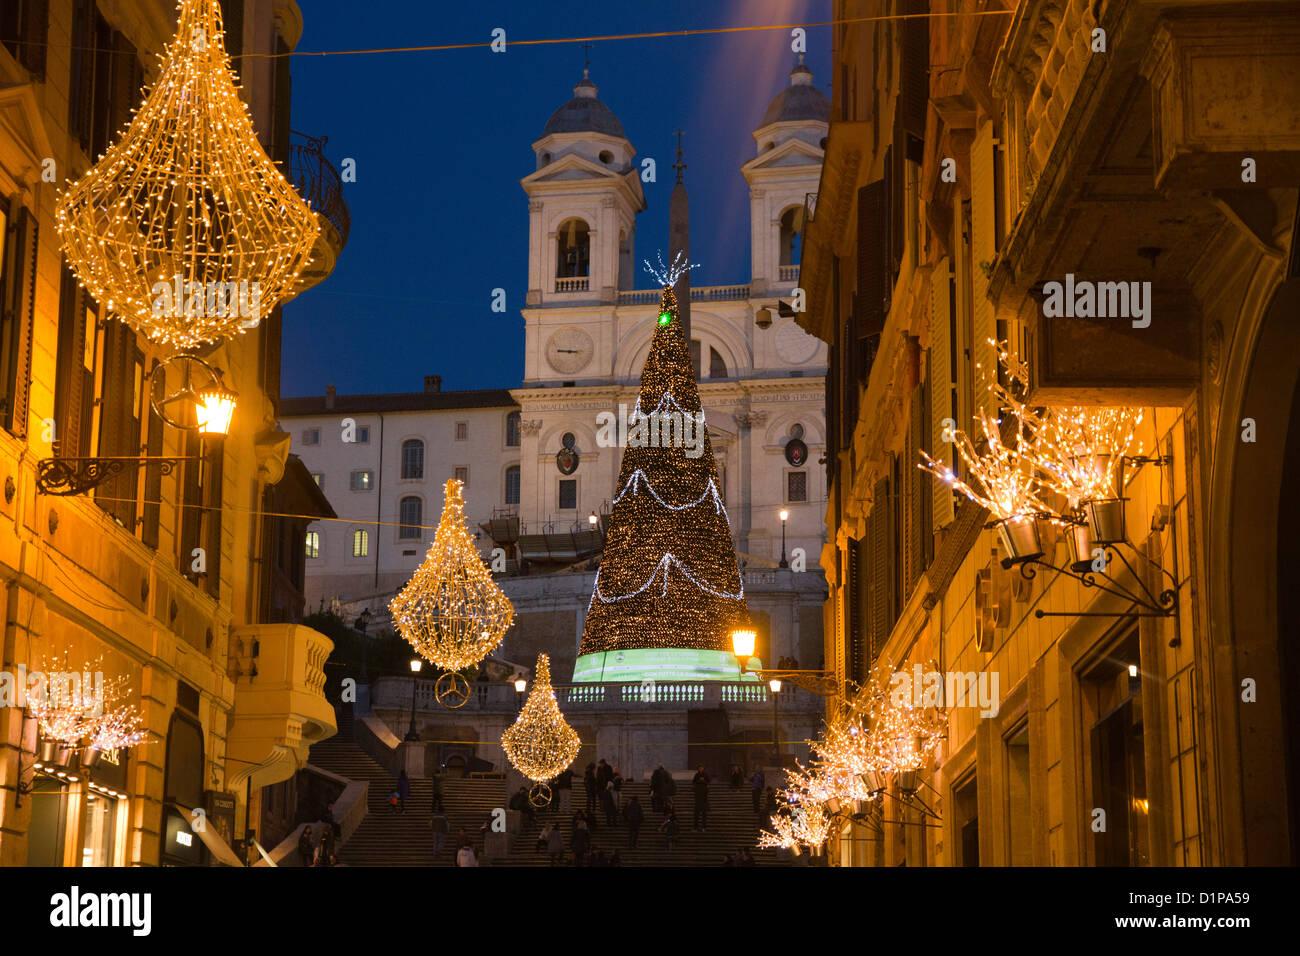 Christmas In Italy Decorations.Via Condotti Rome Italy Christmas Decorations Lights Street